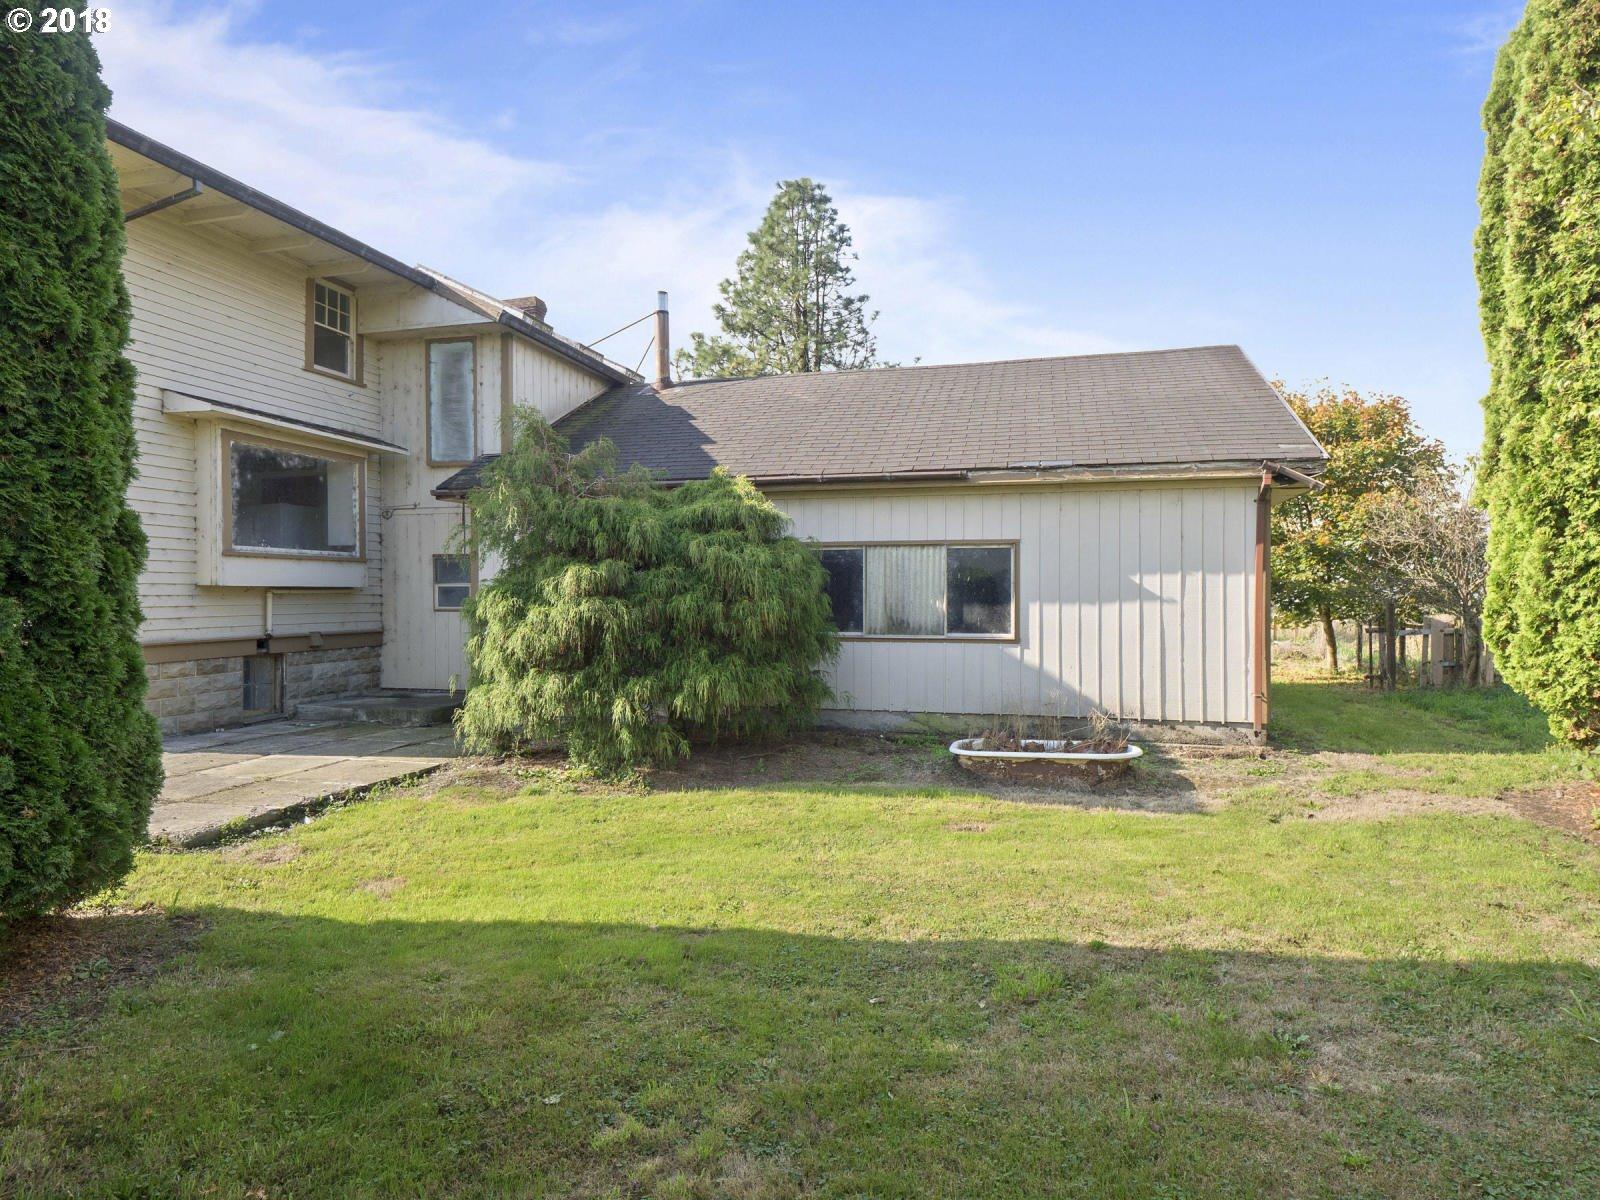 7050 FAIRVIEW RD Tillamook, OR 97141 - MLS #: 18673898